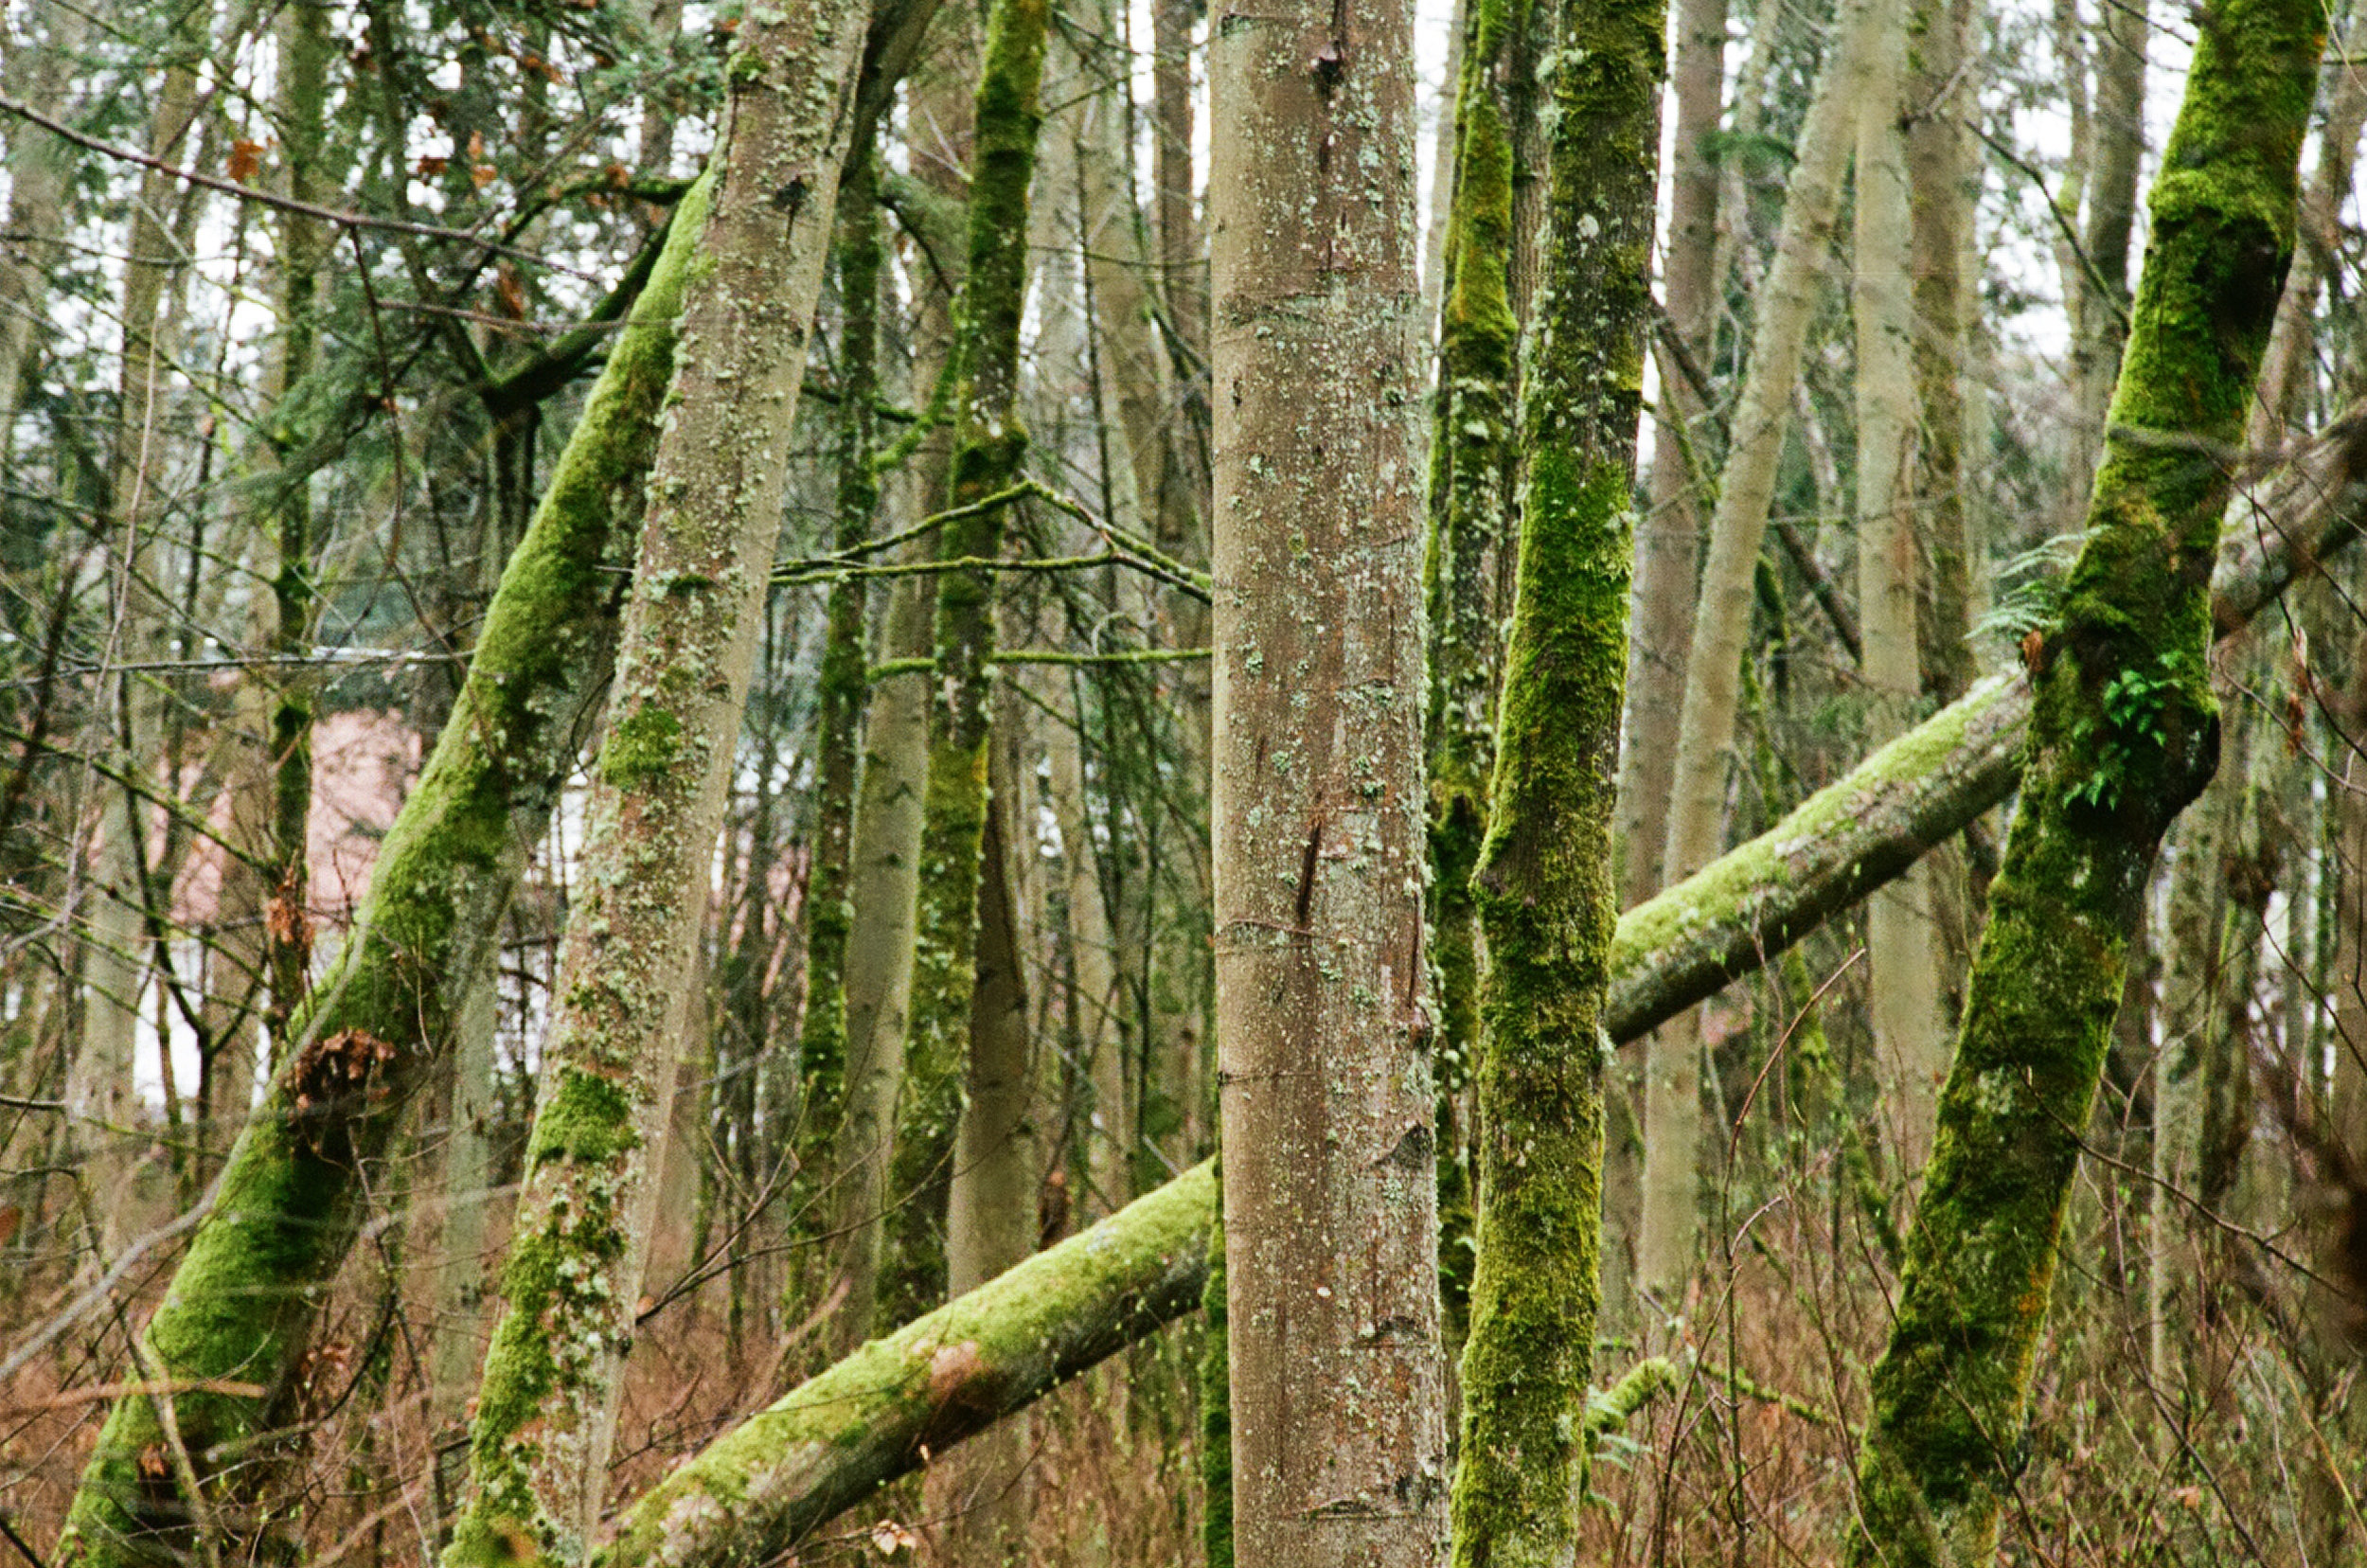 seattle-forest-trees-2-cameliamanea.jpg